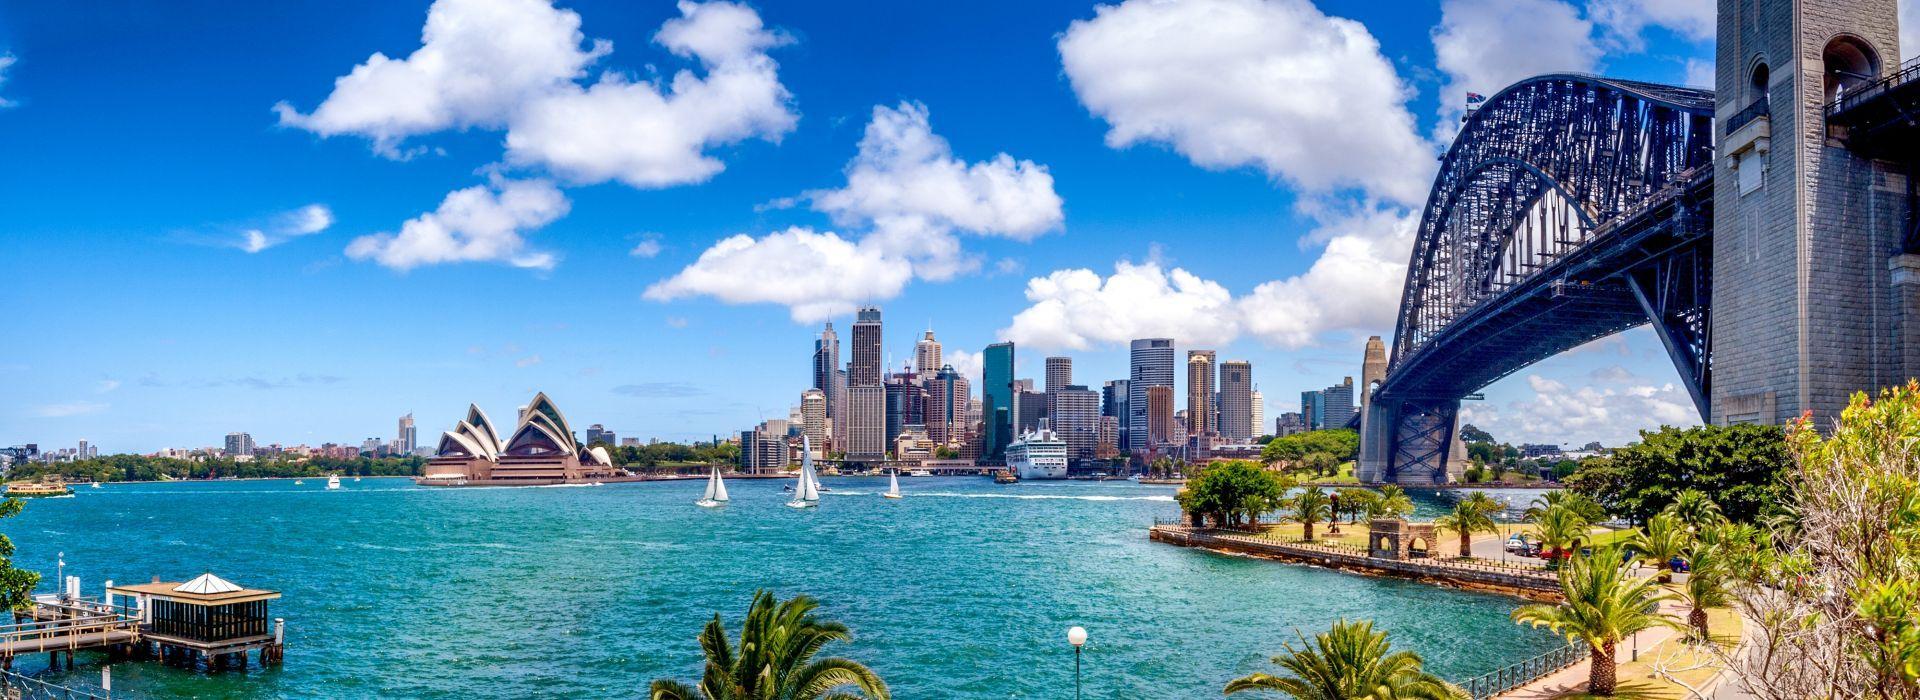 Snorkeling Tours in Sydney